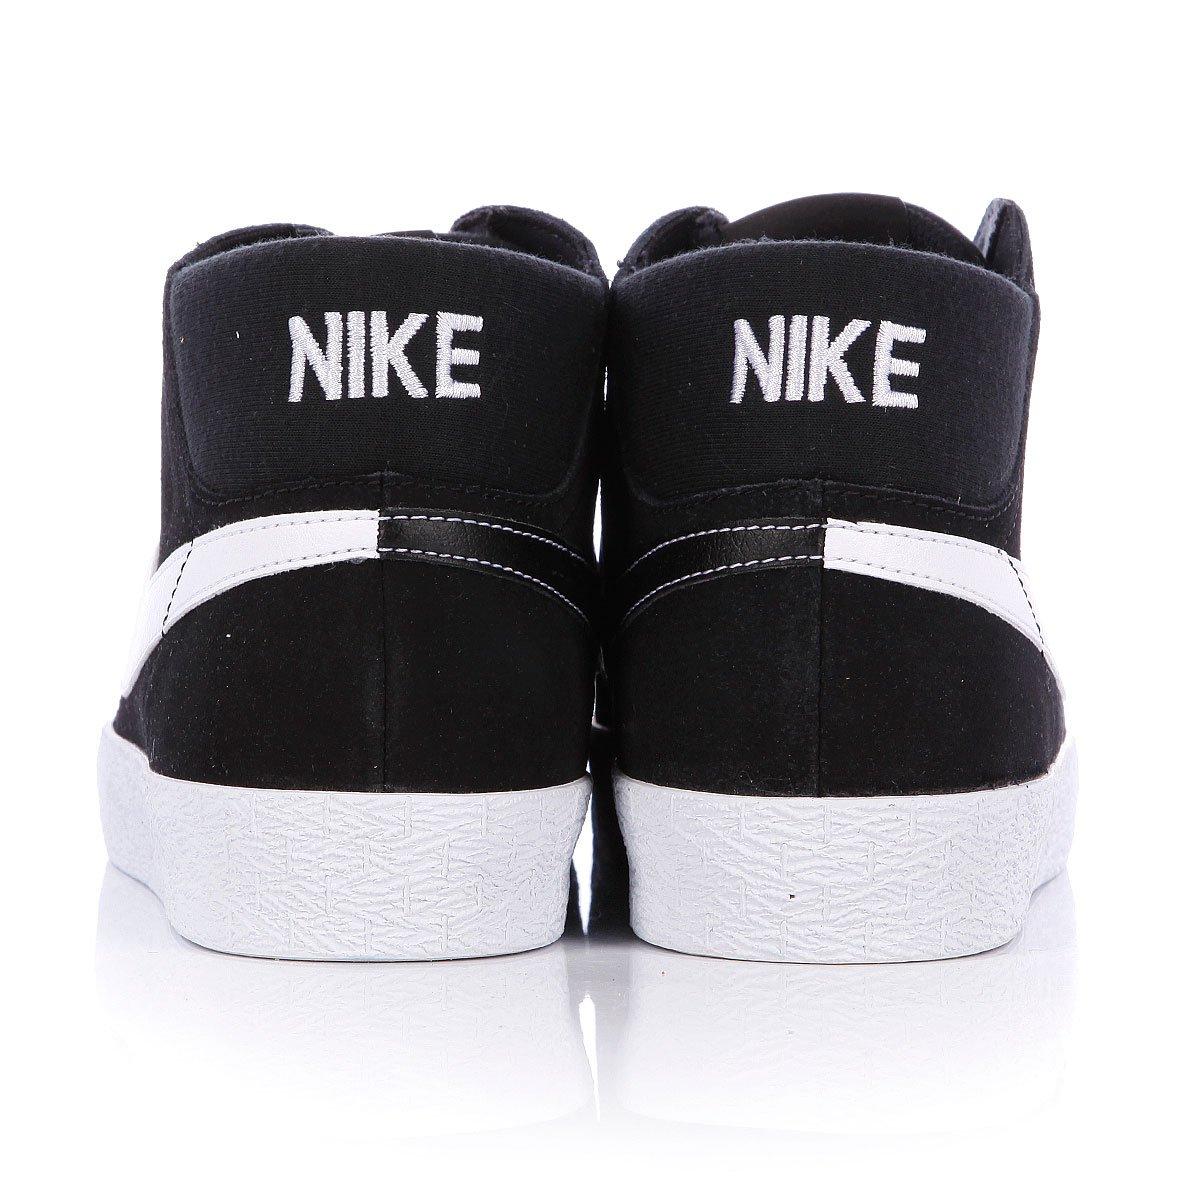 fc20b86f Купить кеды высокие Nike Blazer Mid LR Black/White (510965-004) в ...